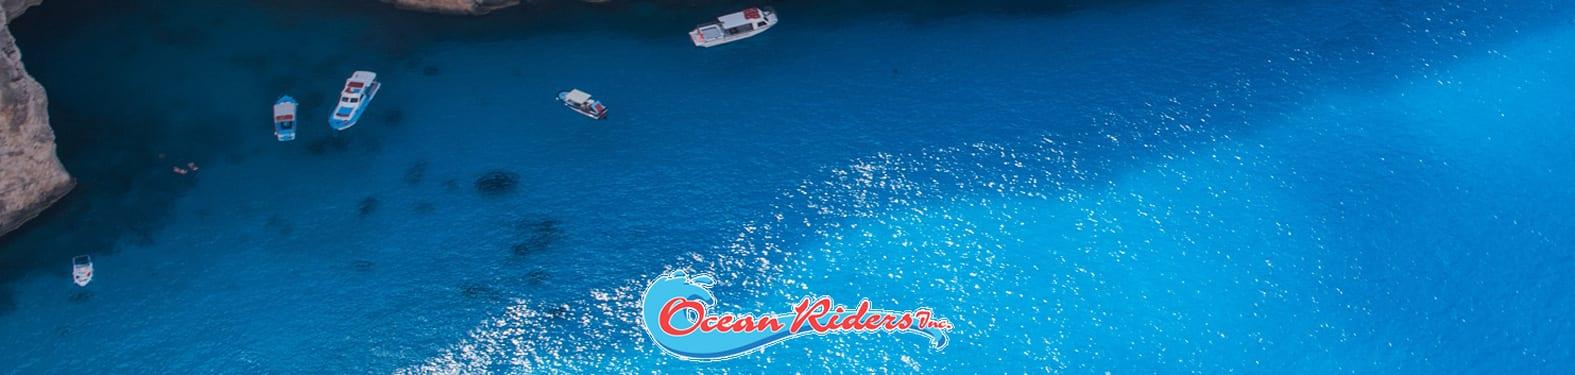 Ocean Riders